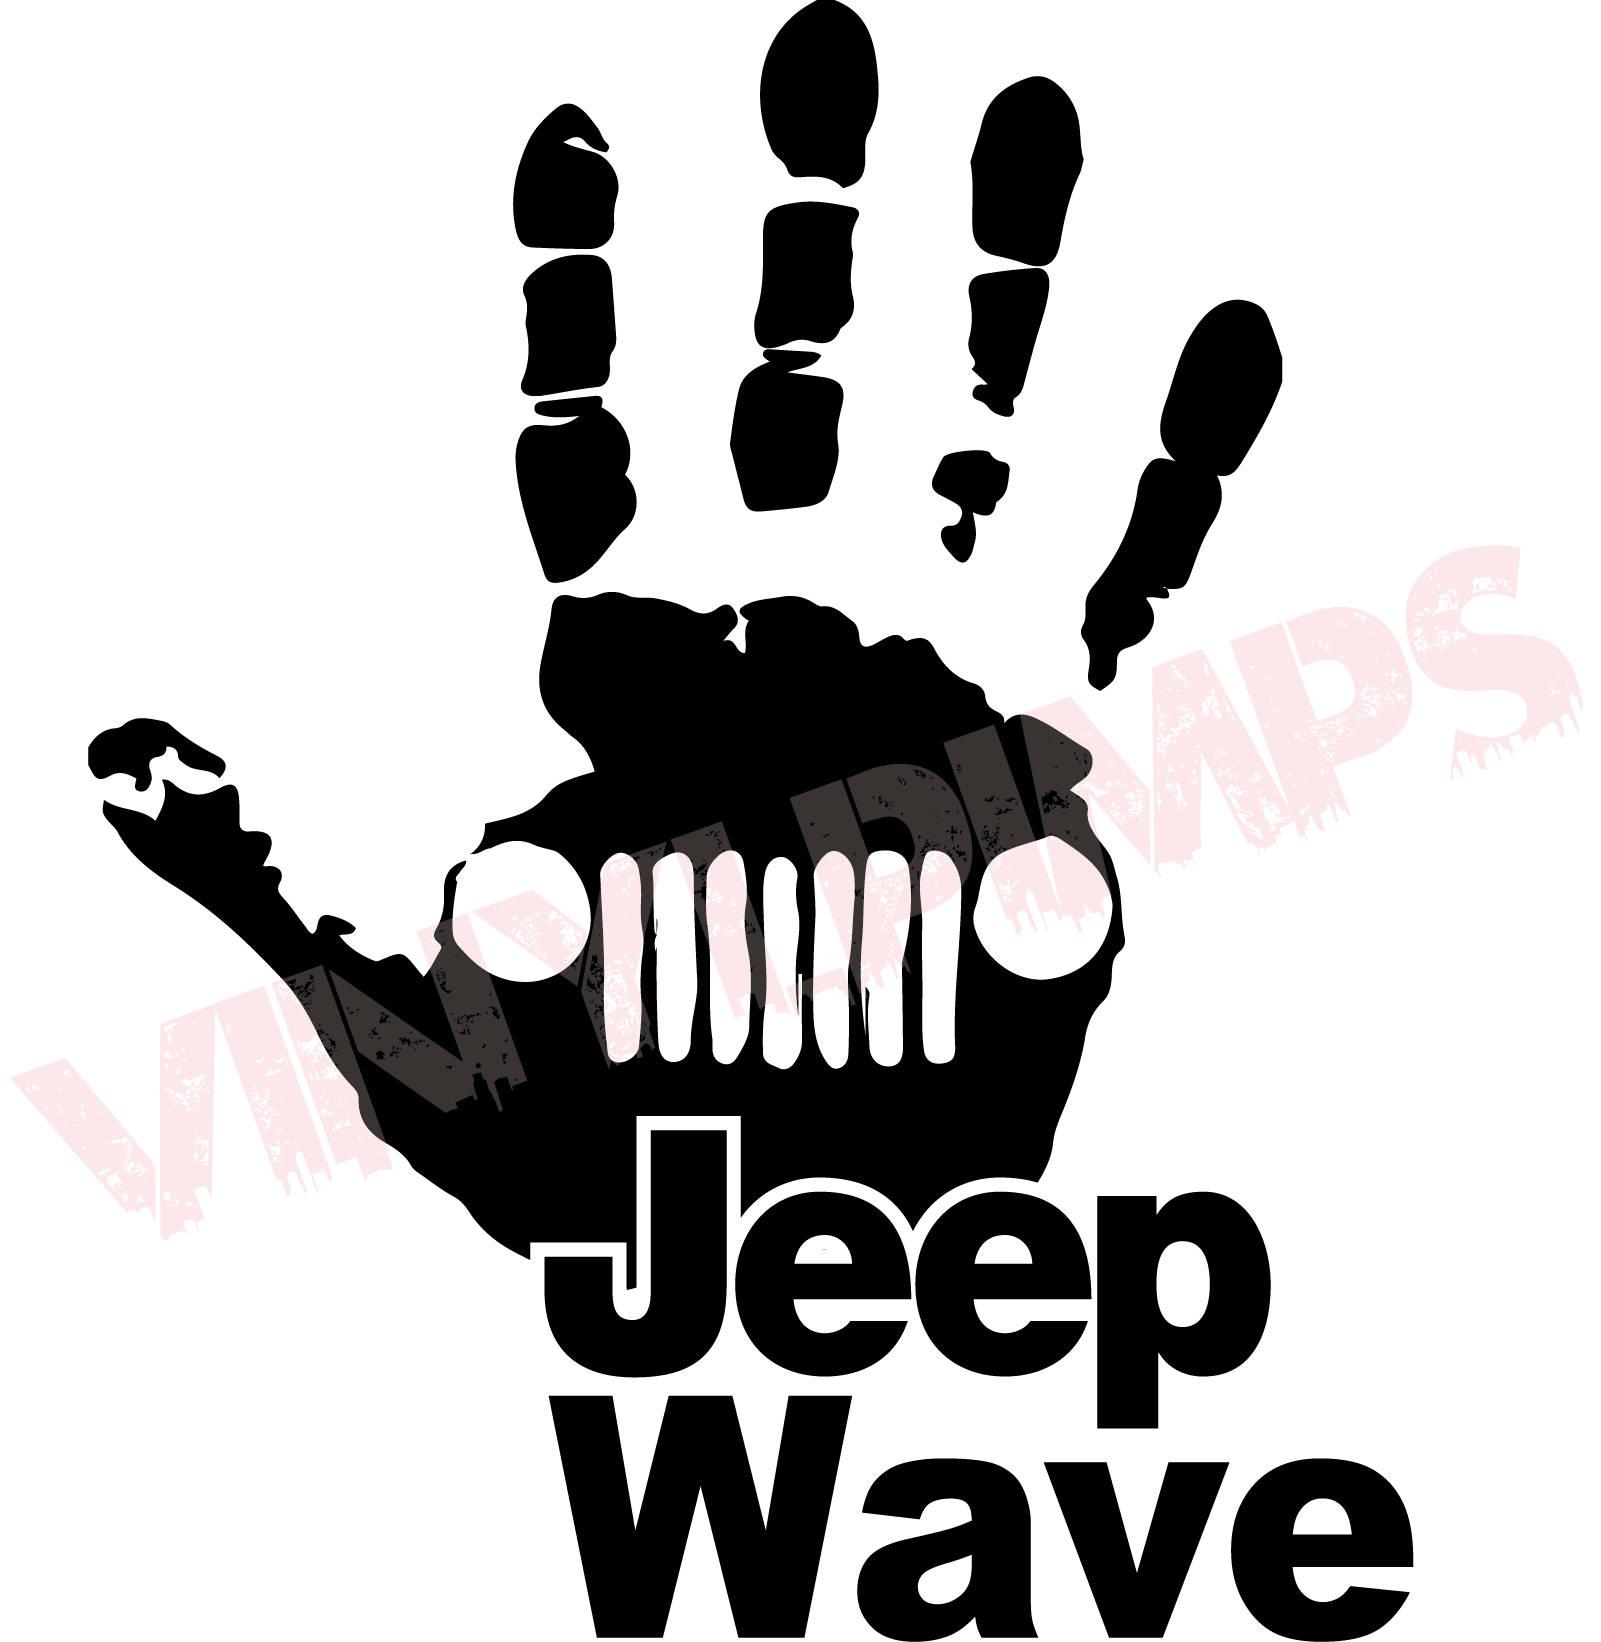 jeep wave decal jeep wrangler unlimited sahara jk tj rh etsy com jeep wrangler logo jacket jeep wrangler logo decals